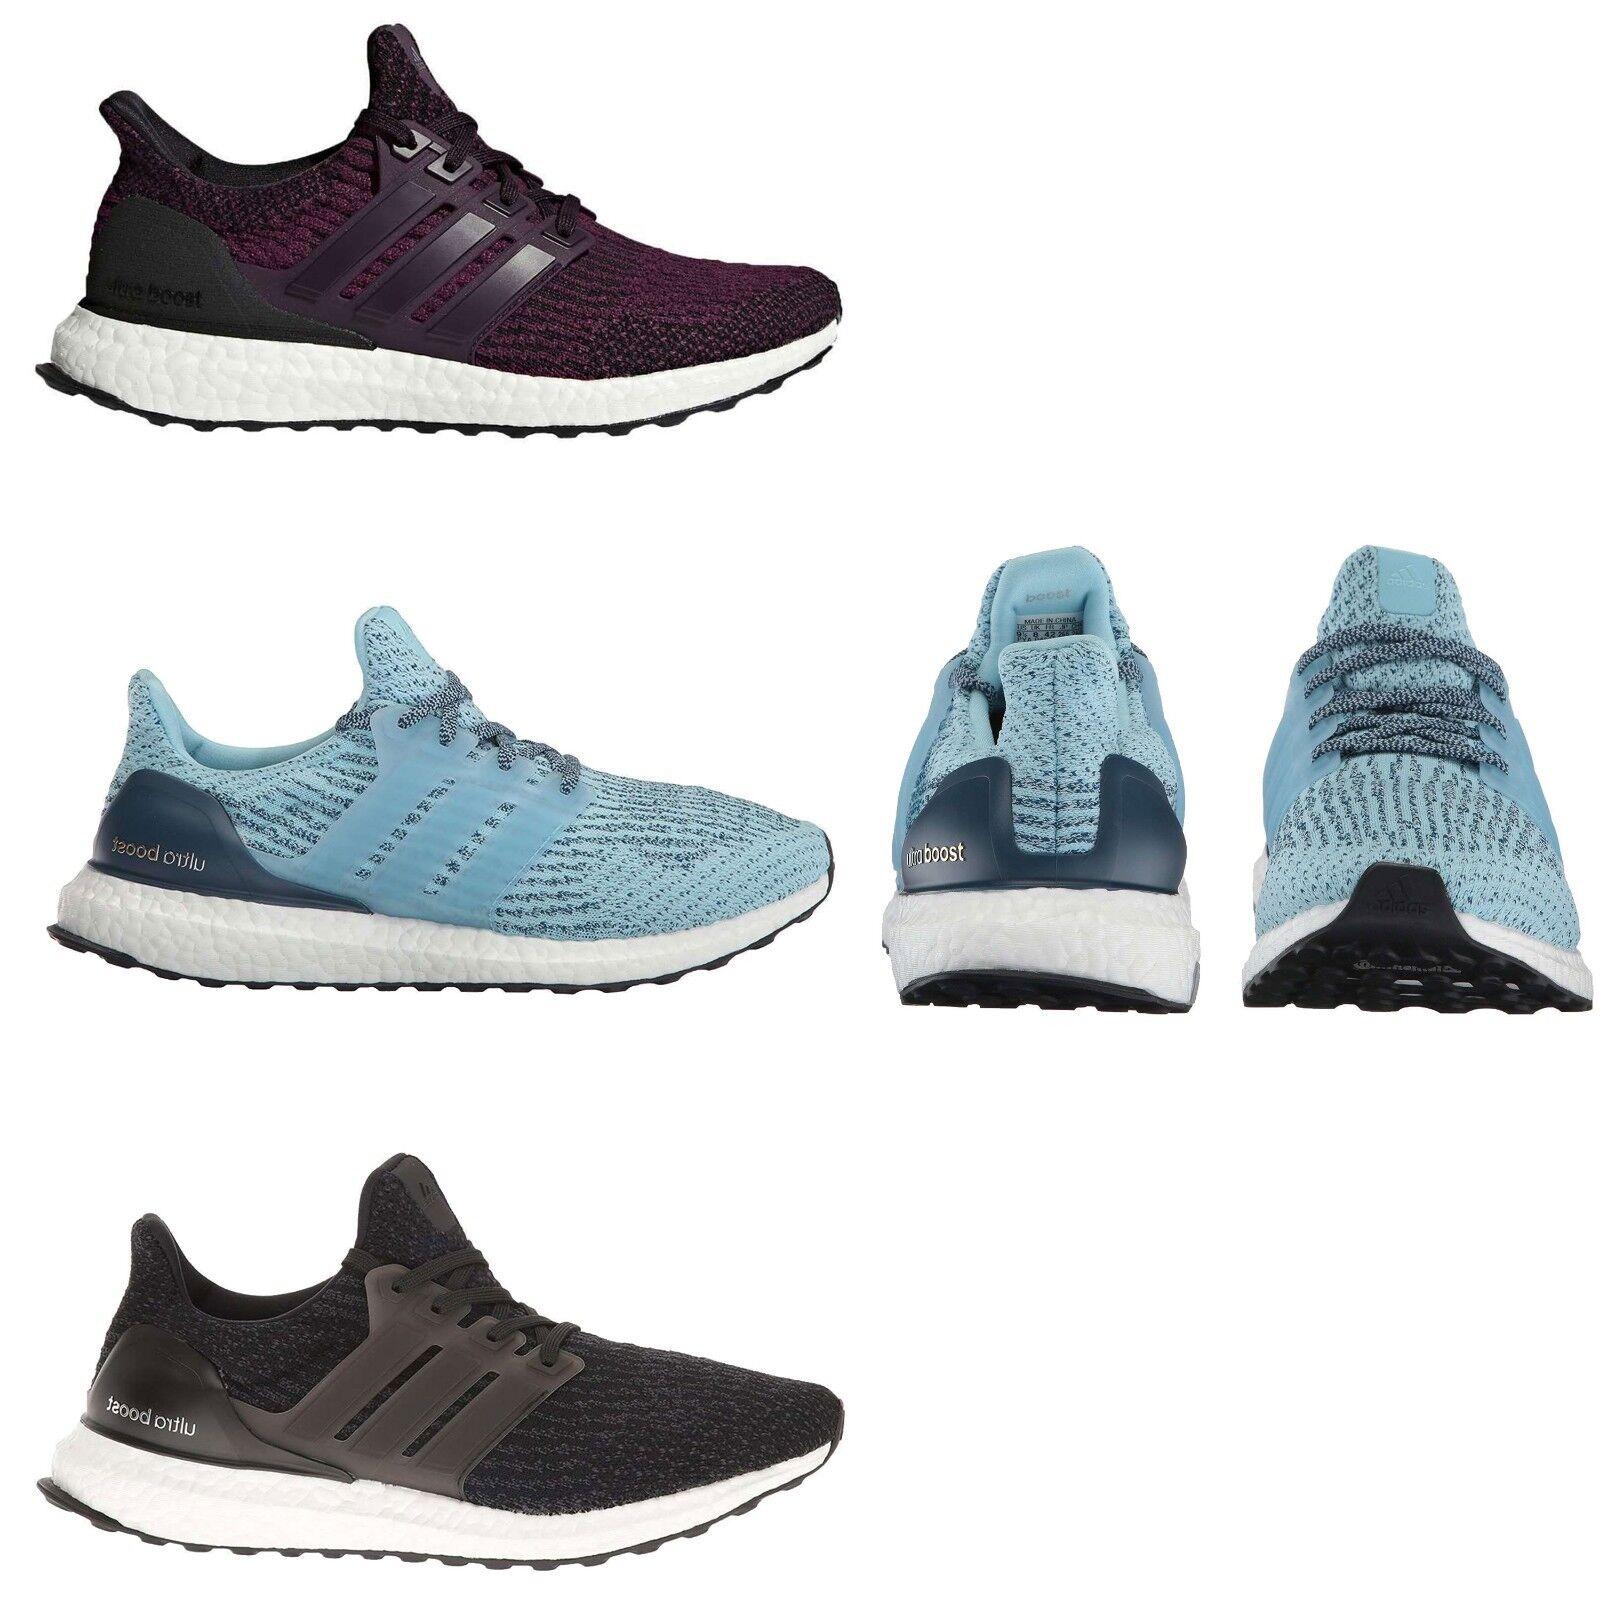 Adidas Damen Ultraboost PrimeKnit Laufschuhe Schwarz Weiß Blau Rote Turnschuhe